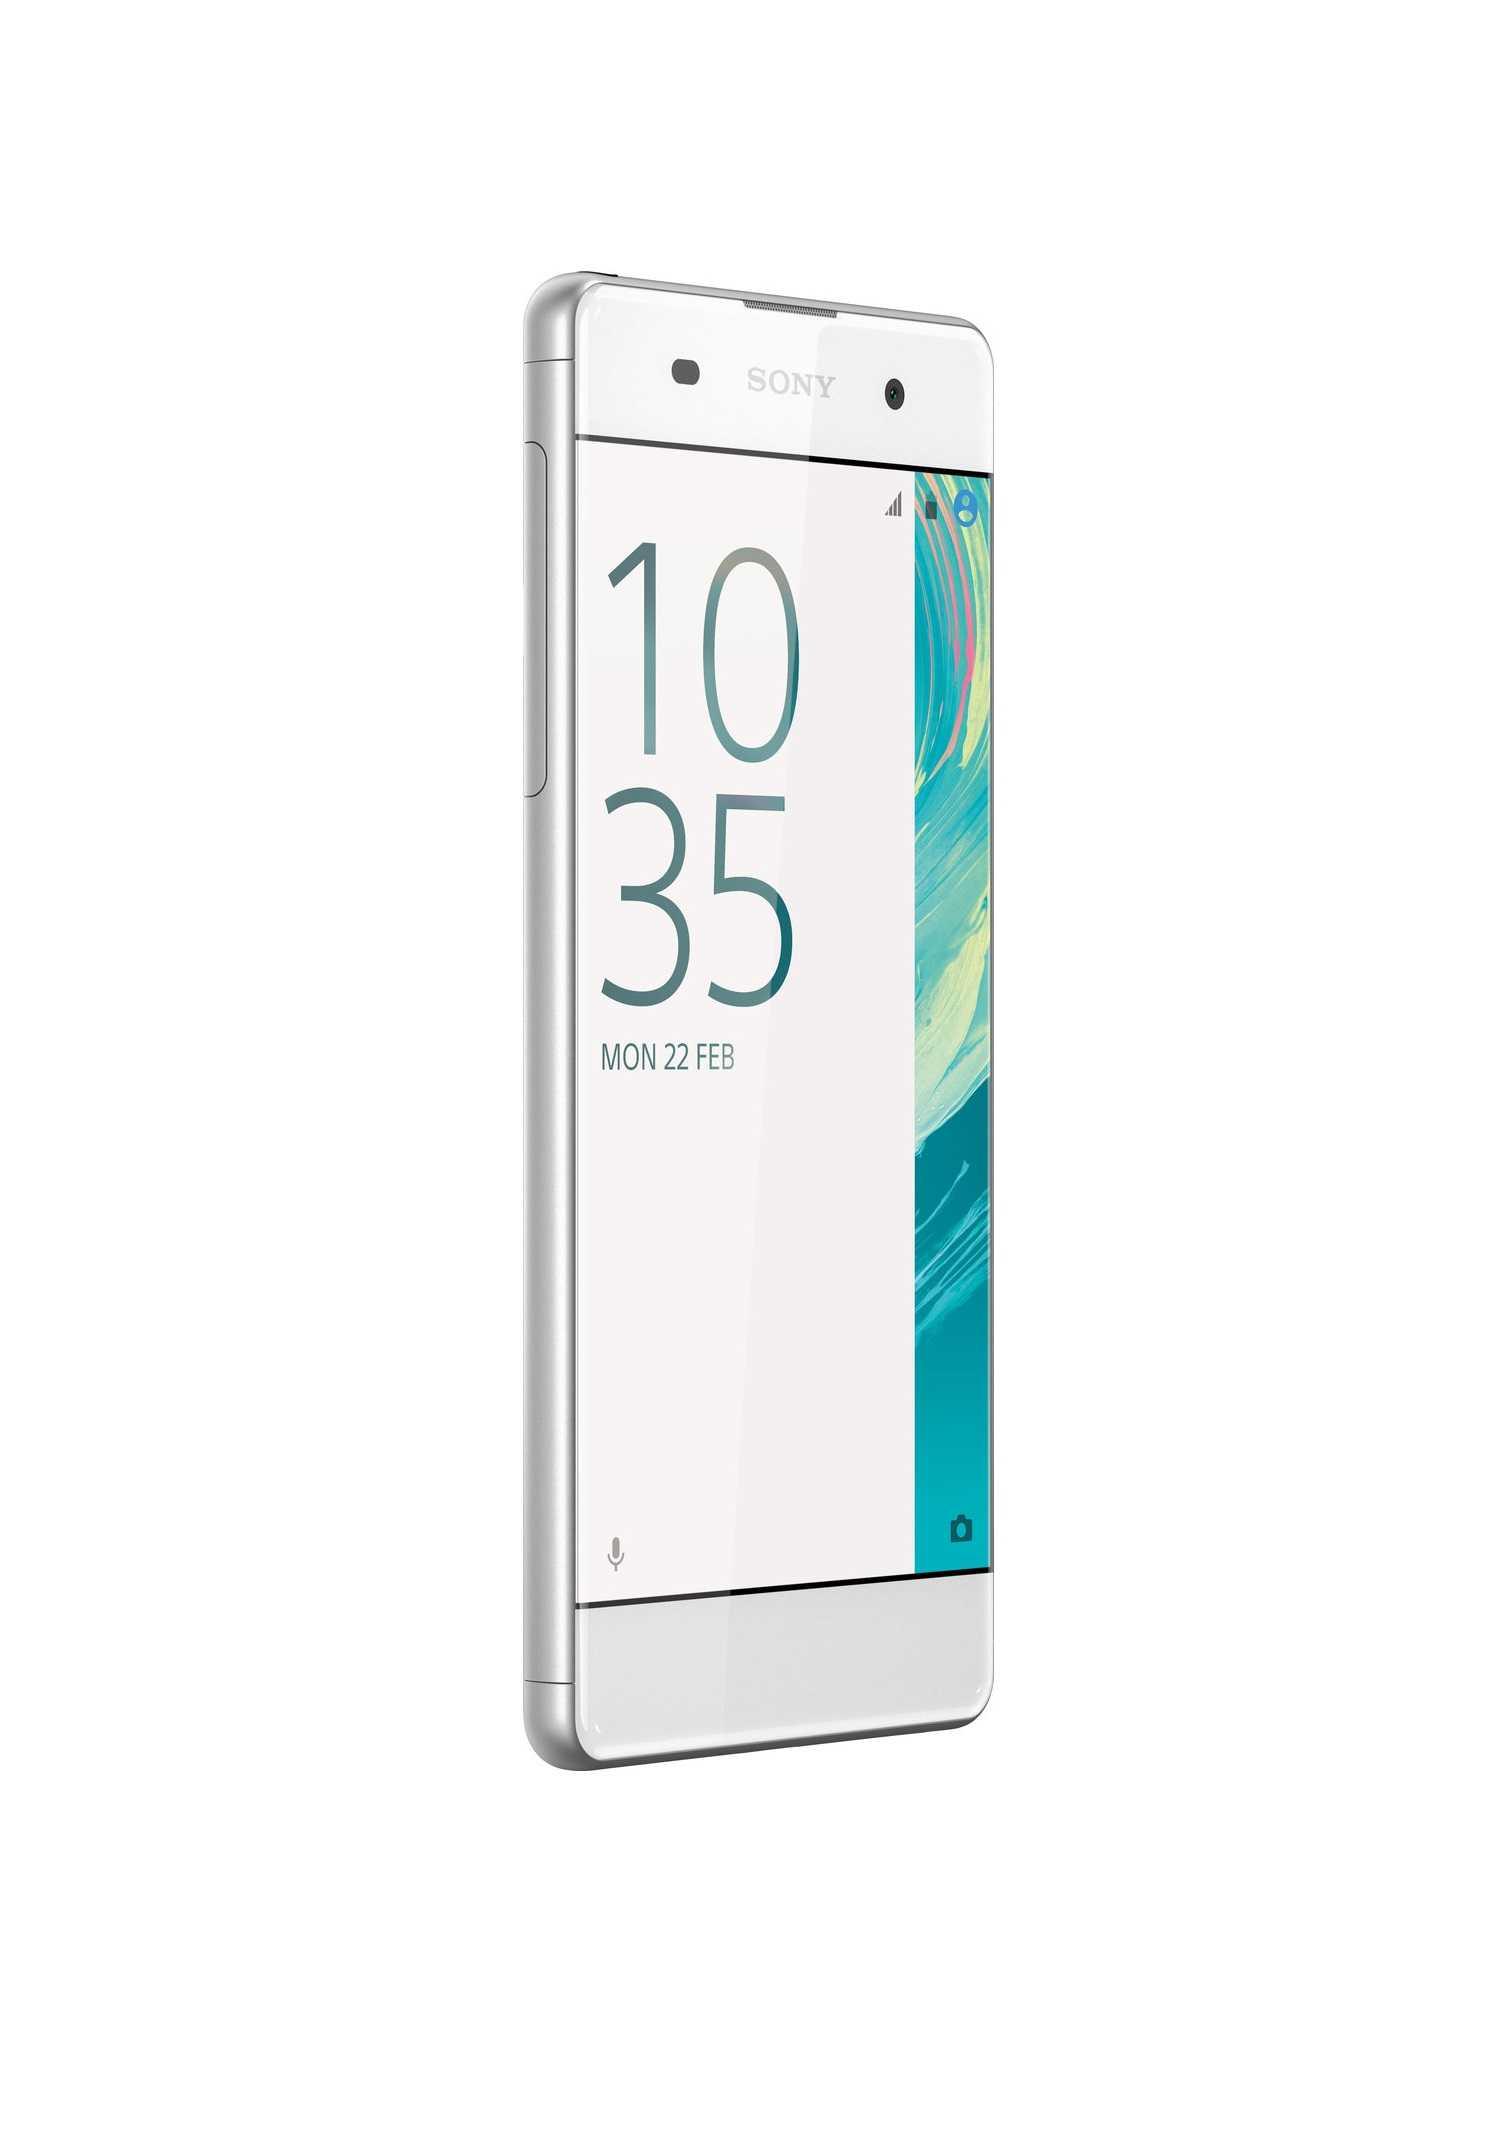 sony xperia xa smartphone 5 zoll fuer 124 e inkl versand statt 13999e 1